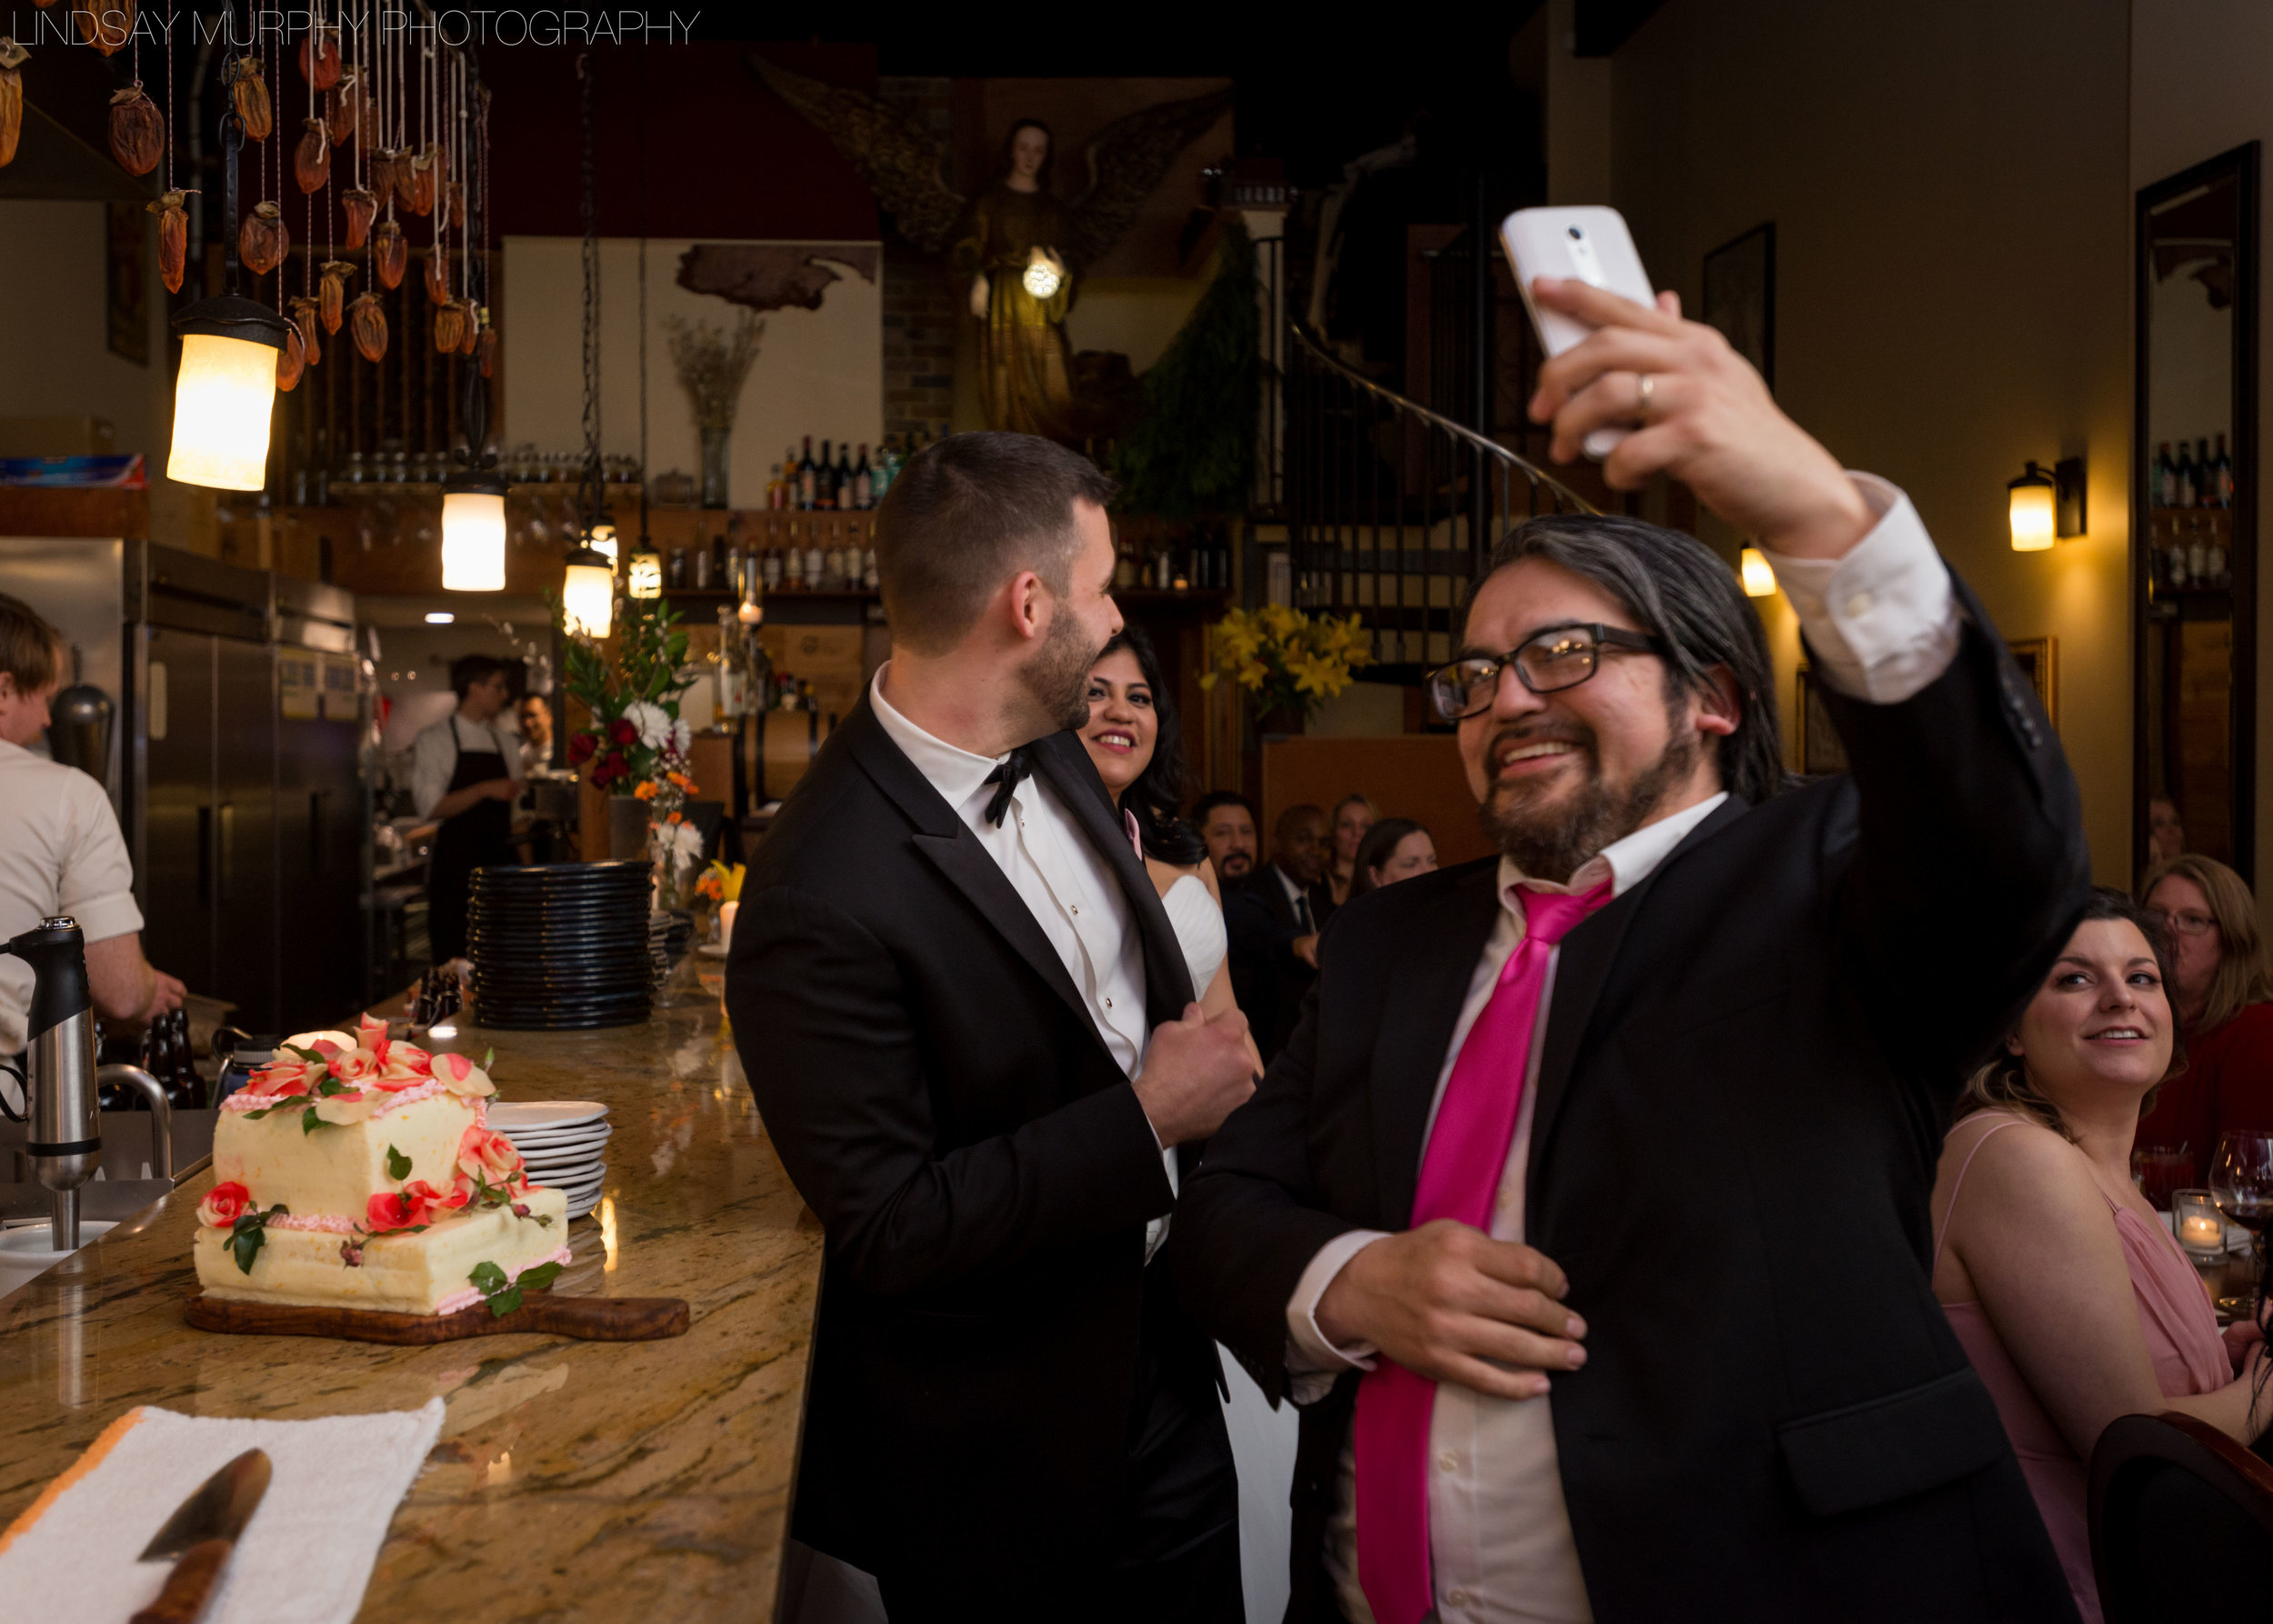 seattle_wedding_photography-153.jpg